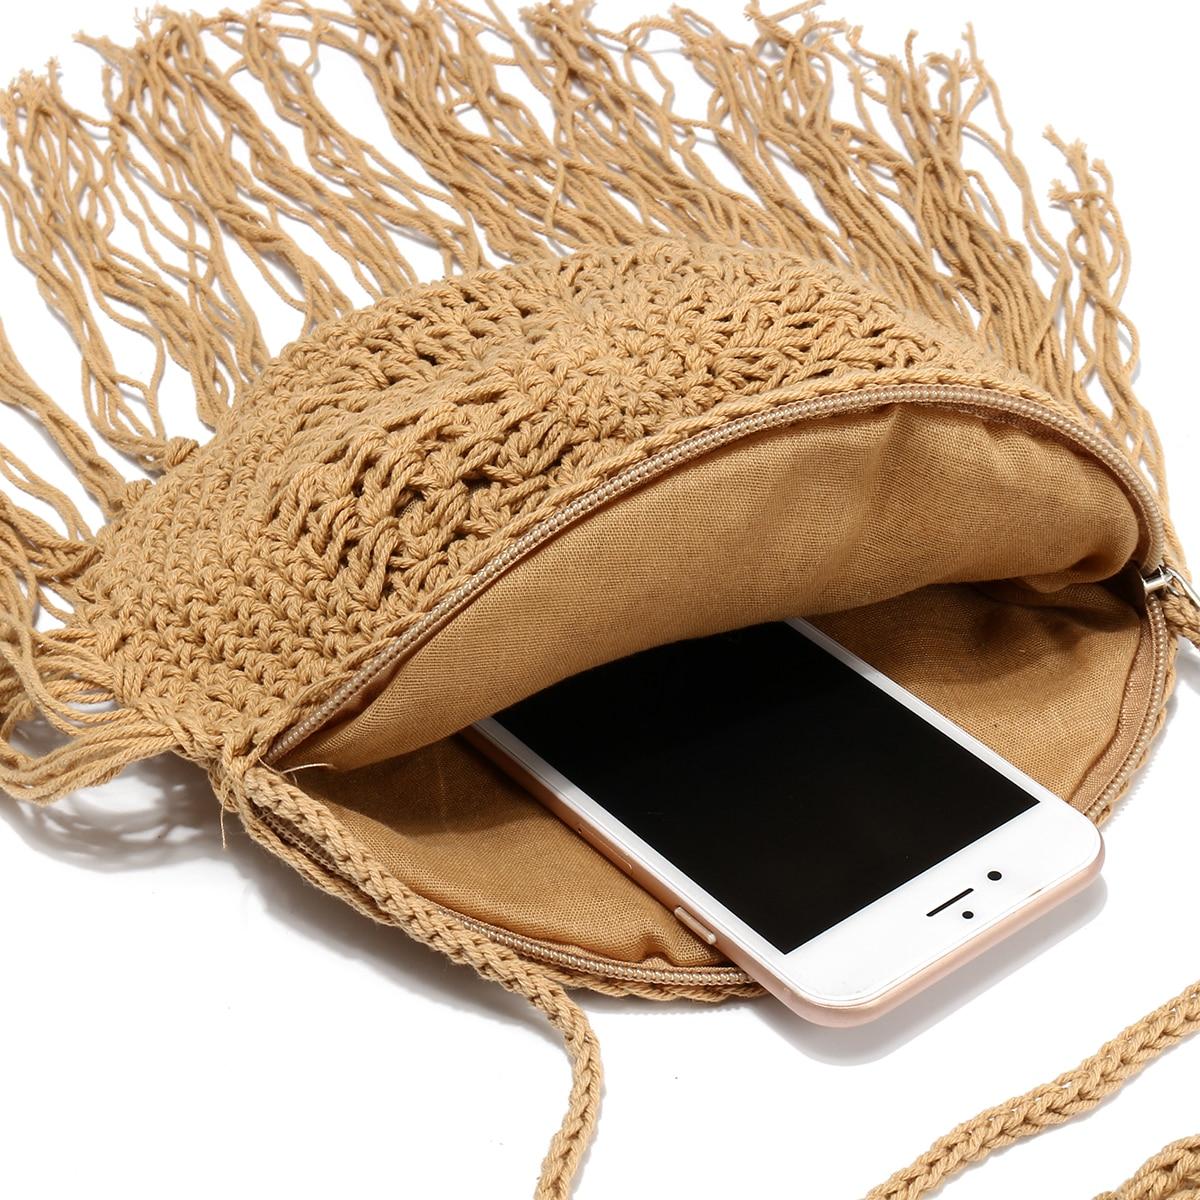 Round Straw Bag with Fringe Tassel 4